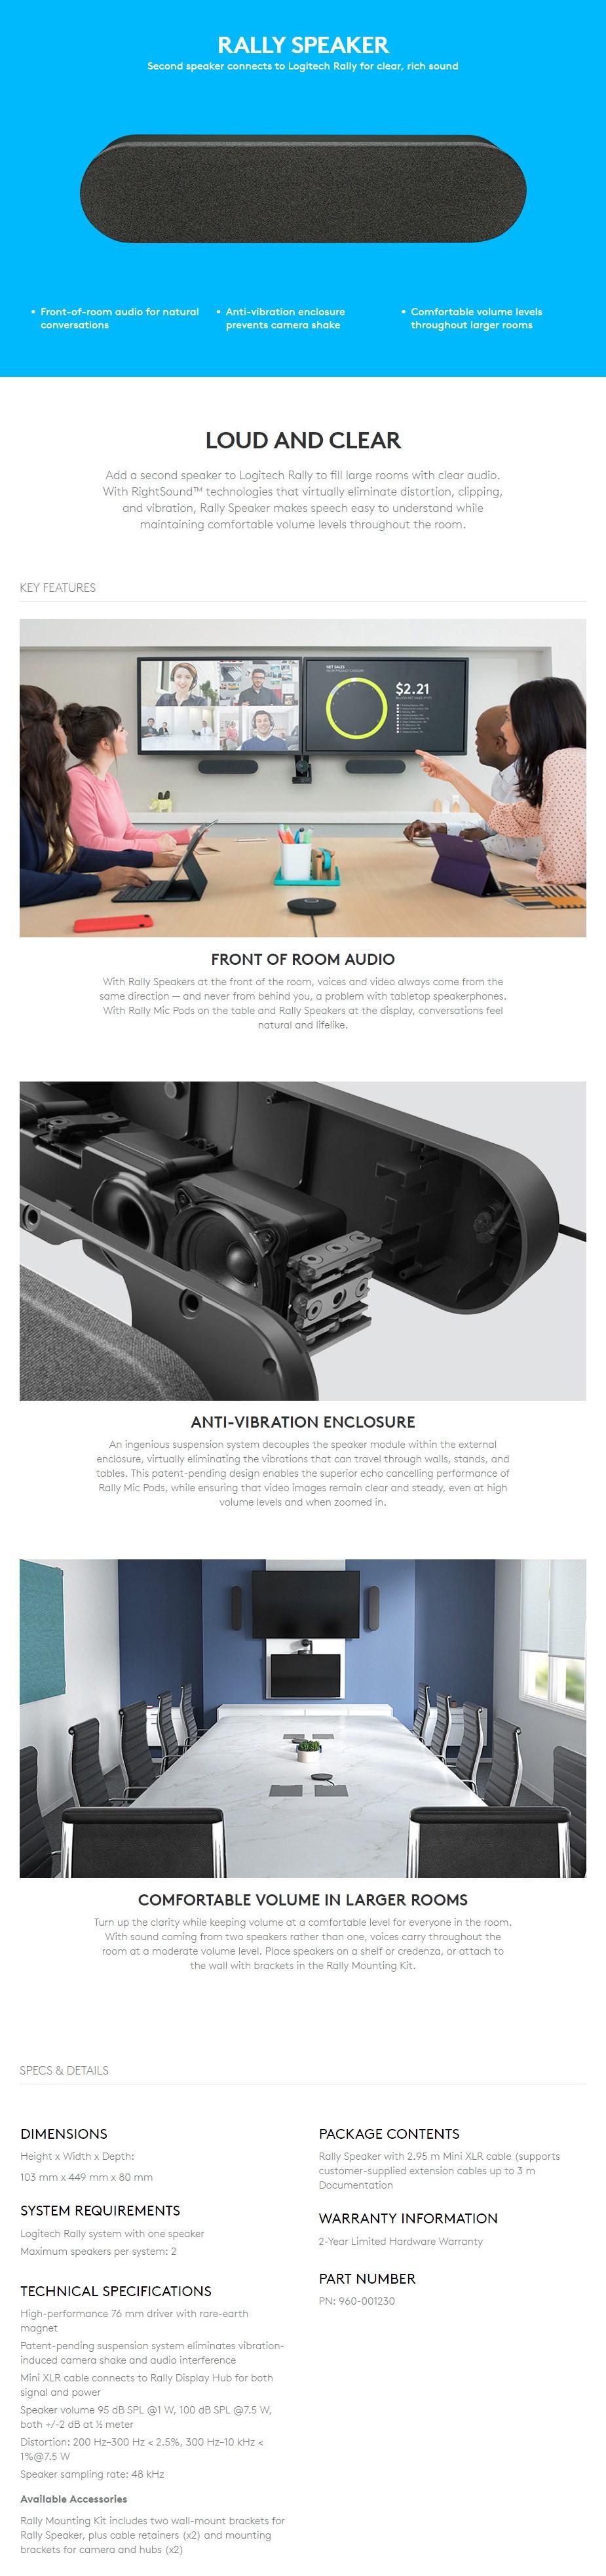 Logitech Rally Speaker - Overview 1